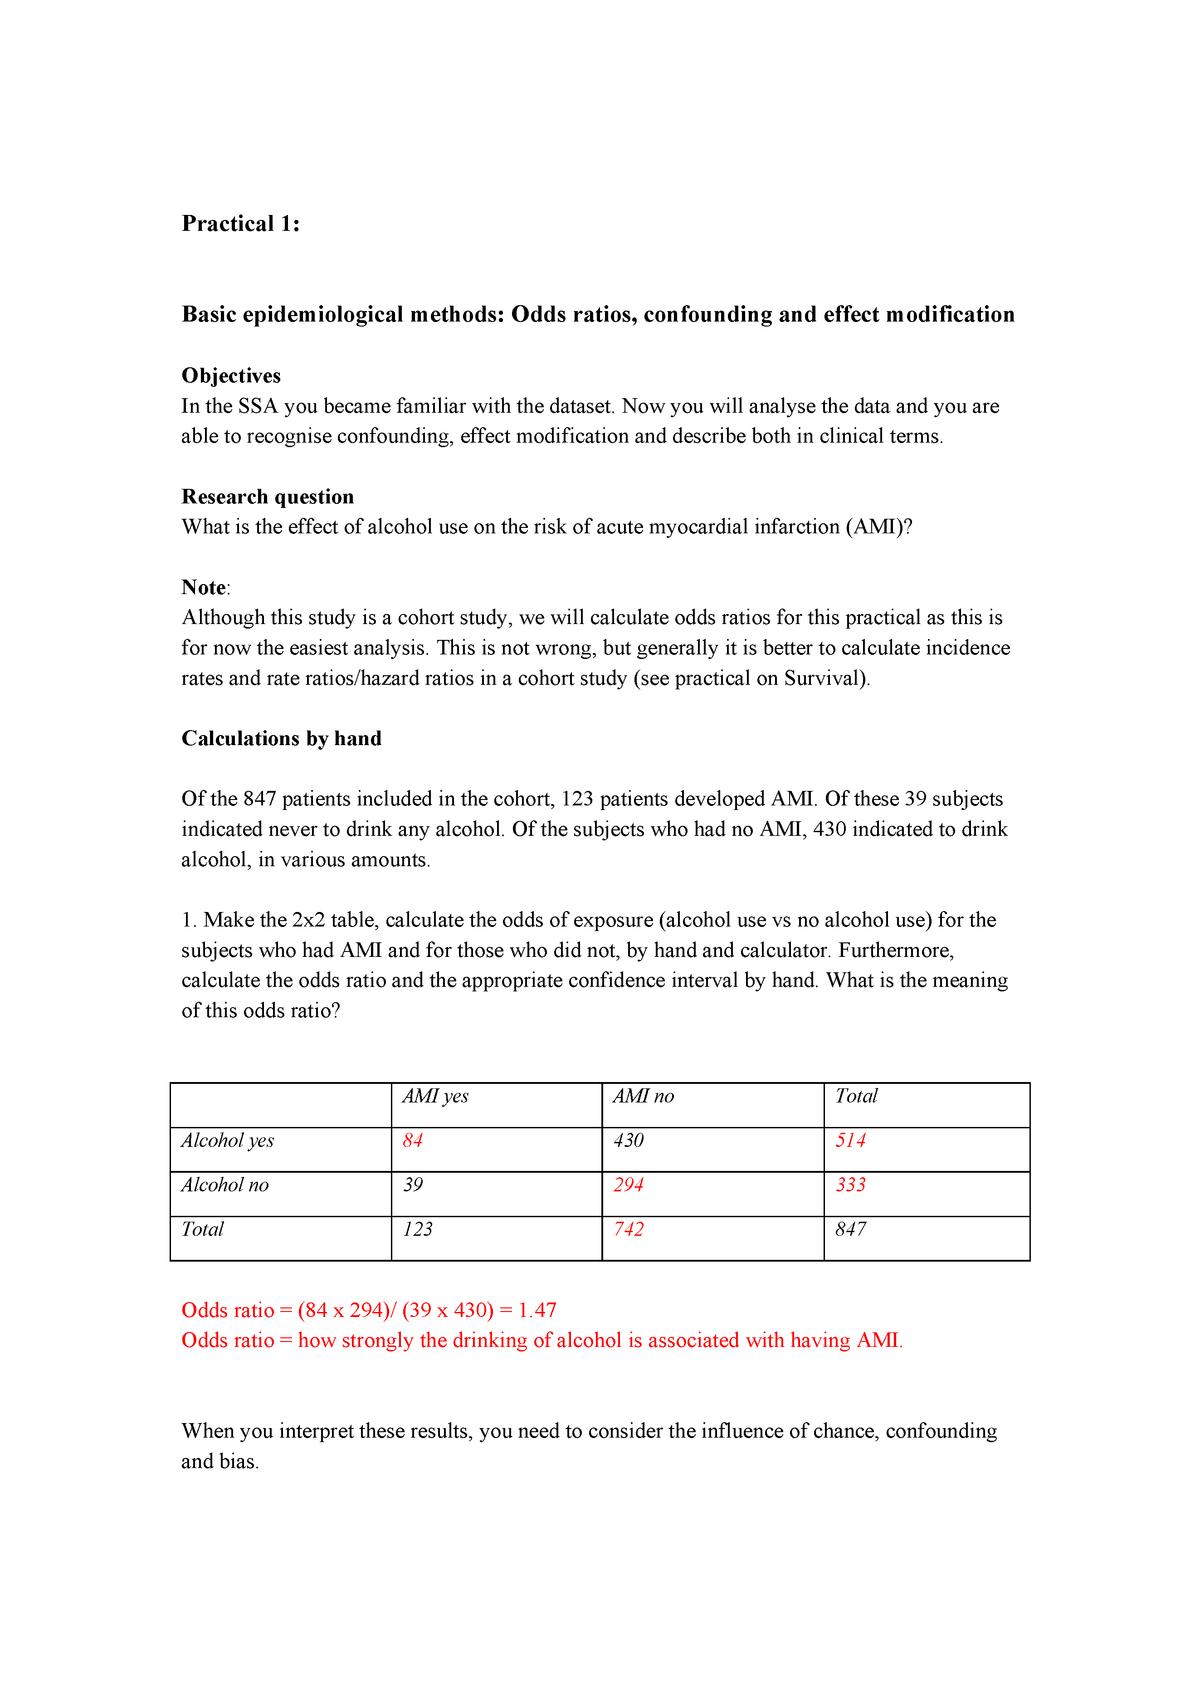 CRIP practical 1 - 312030300Y: CRiP - Advanced Concepts in